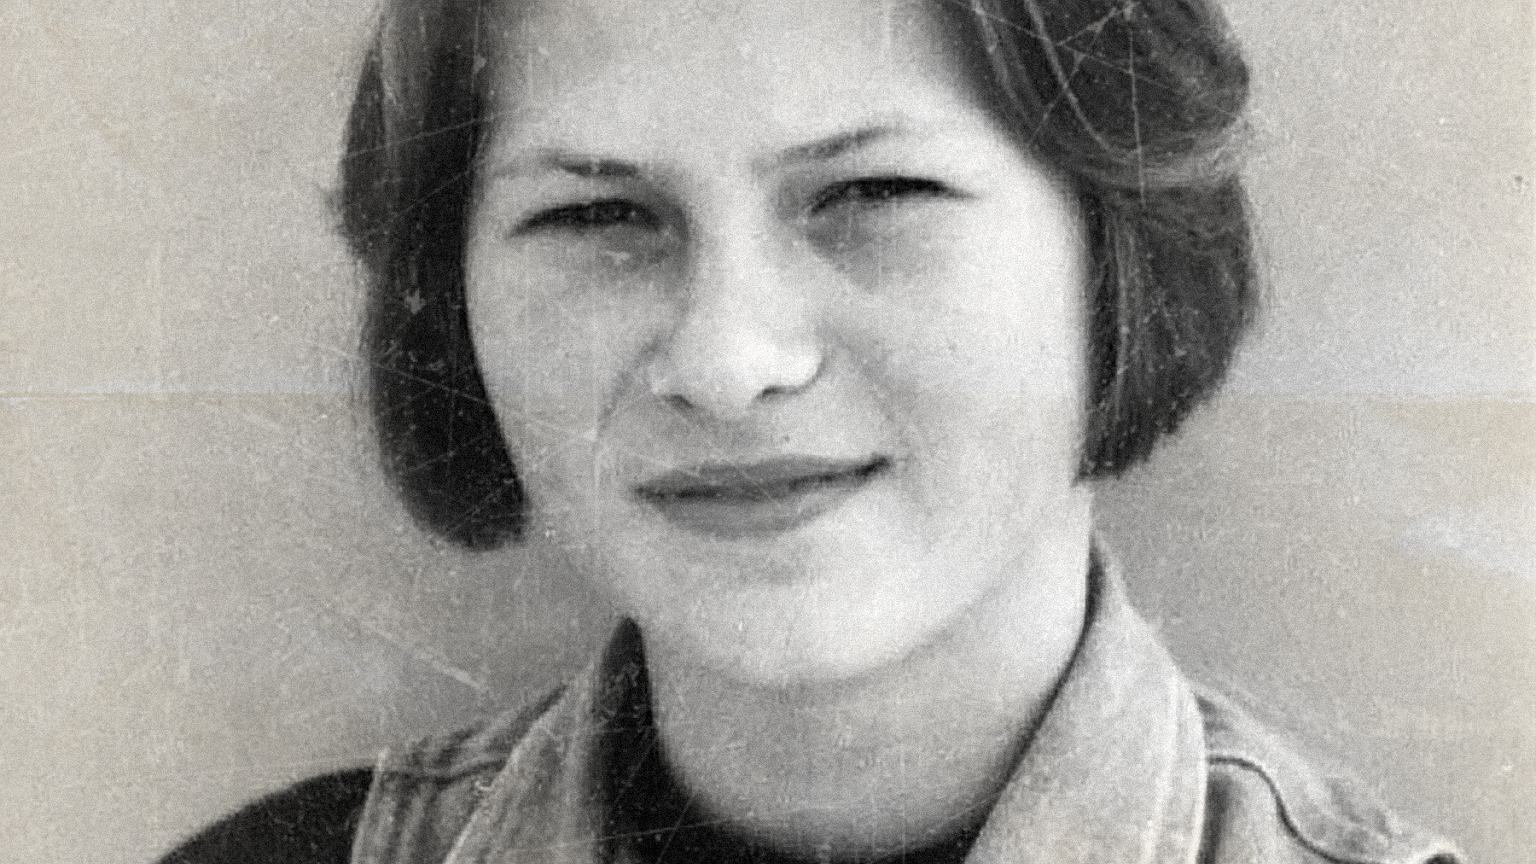 Iwona Cygan, 17, was murdered in Szczucin in 1998